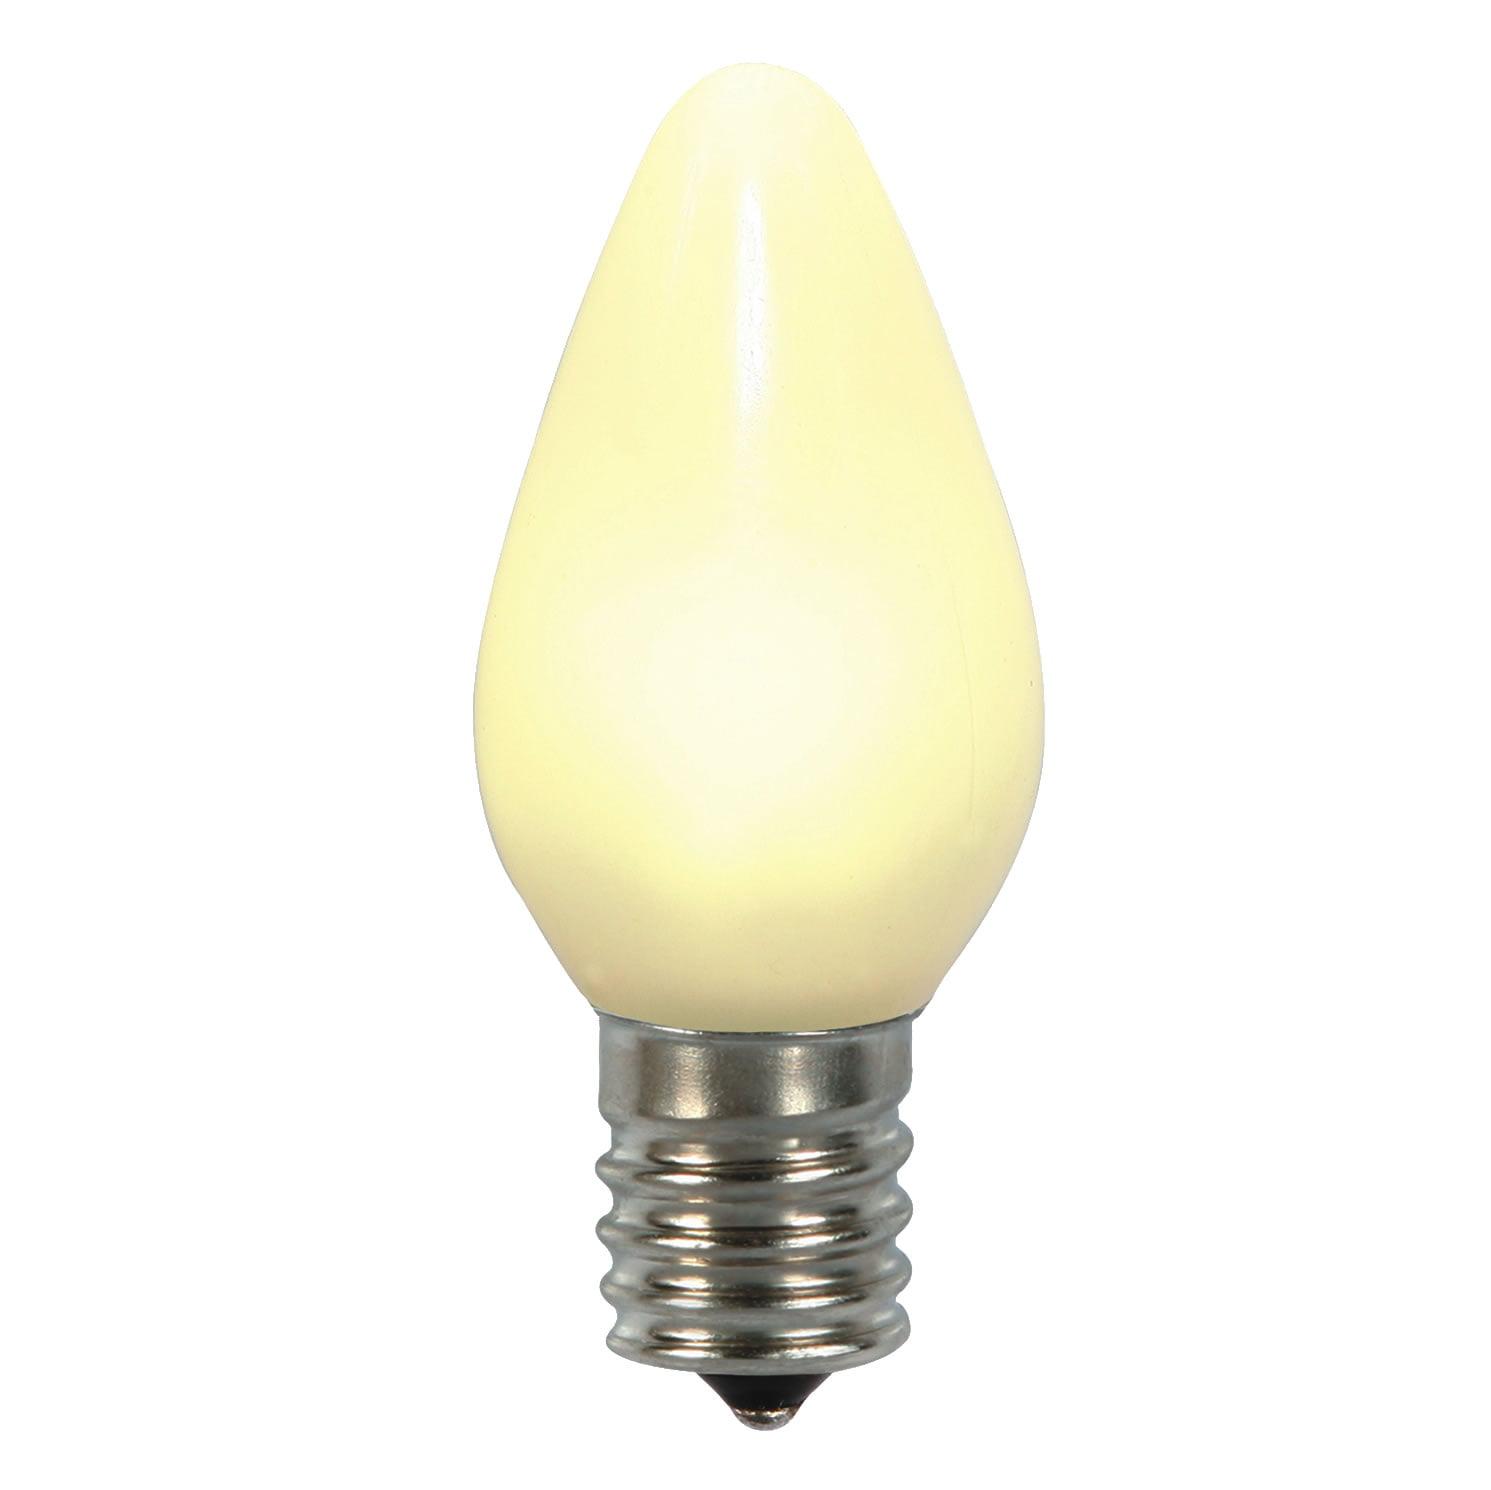 Vickerman C7 Ceramic LED Warm White Twinkle Replacement Bulb